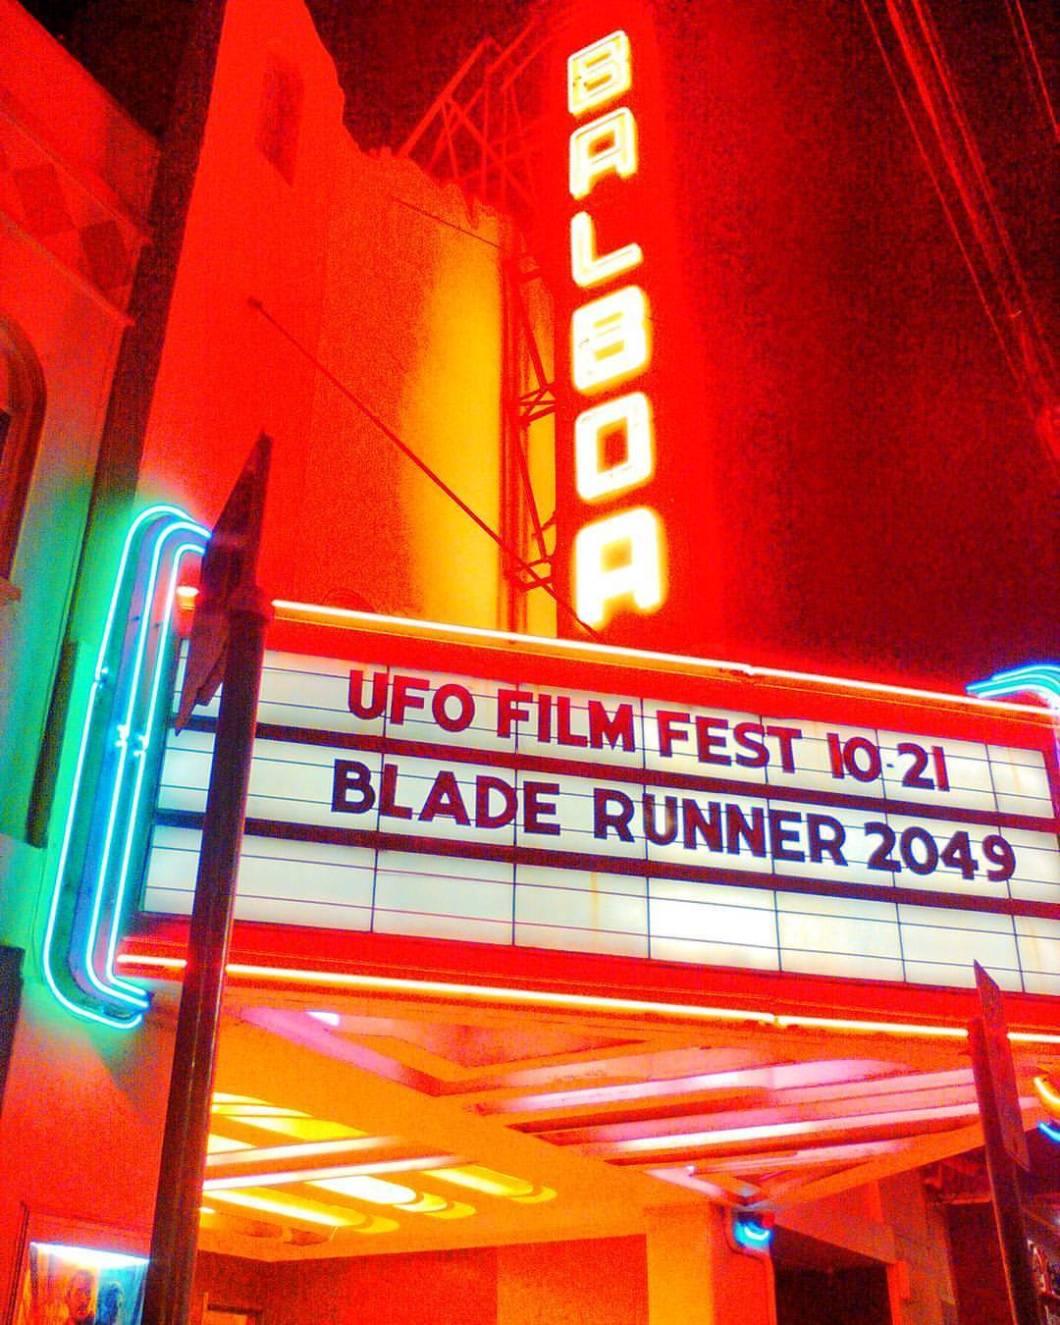 bladerunner2049 at balboa